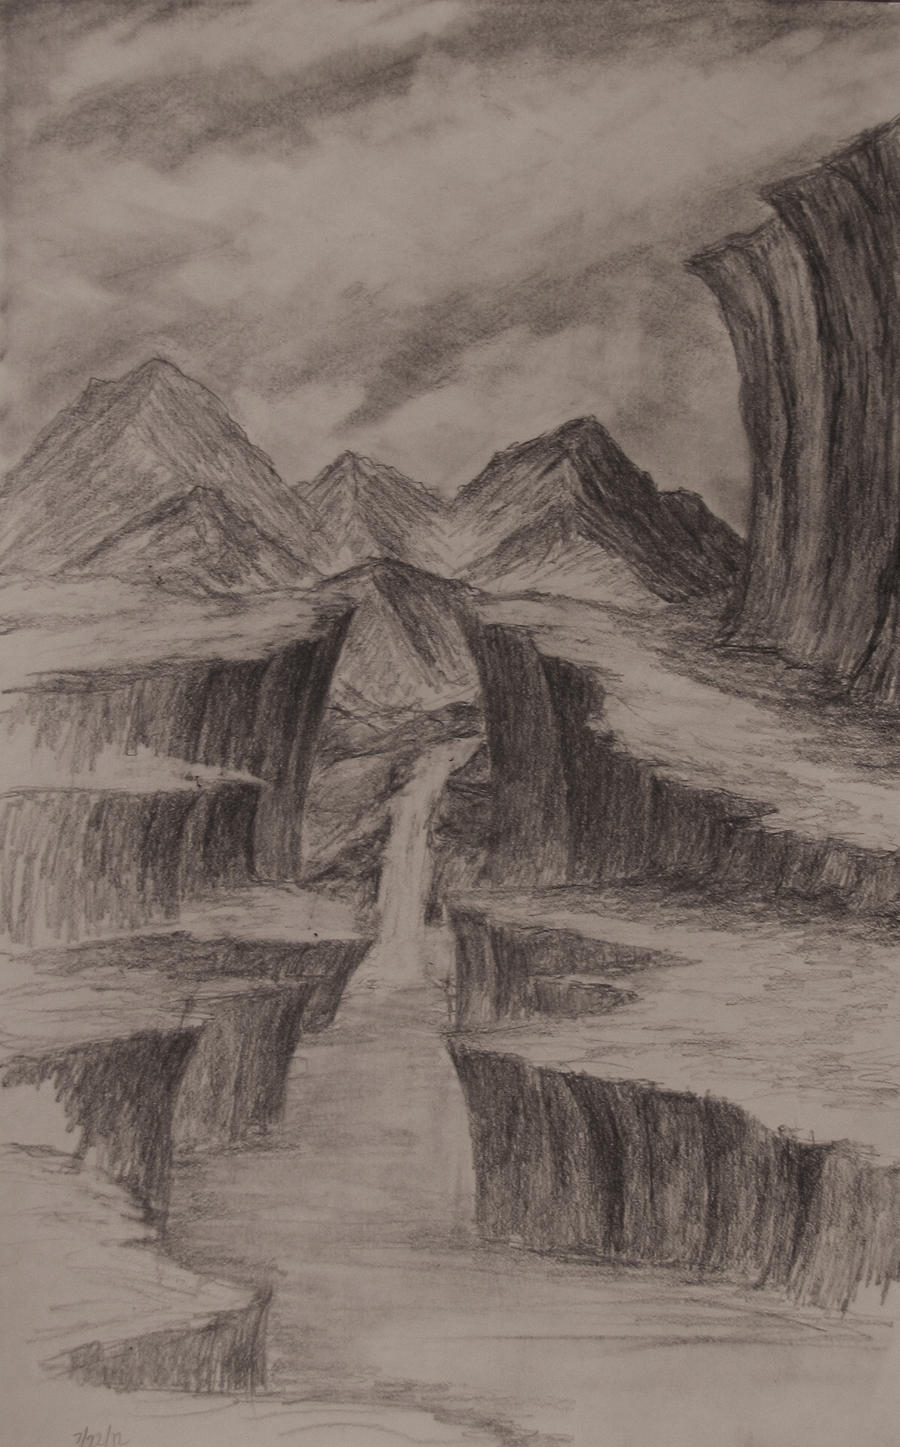 Sketch: The Big Cliffs by TylersArtShack